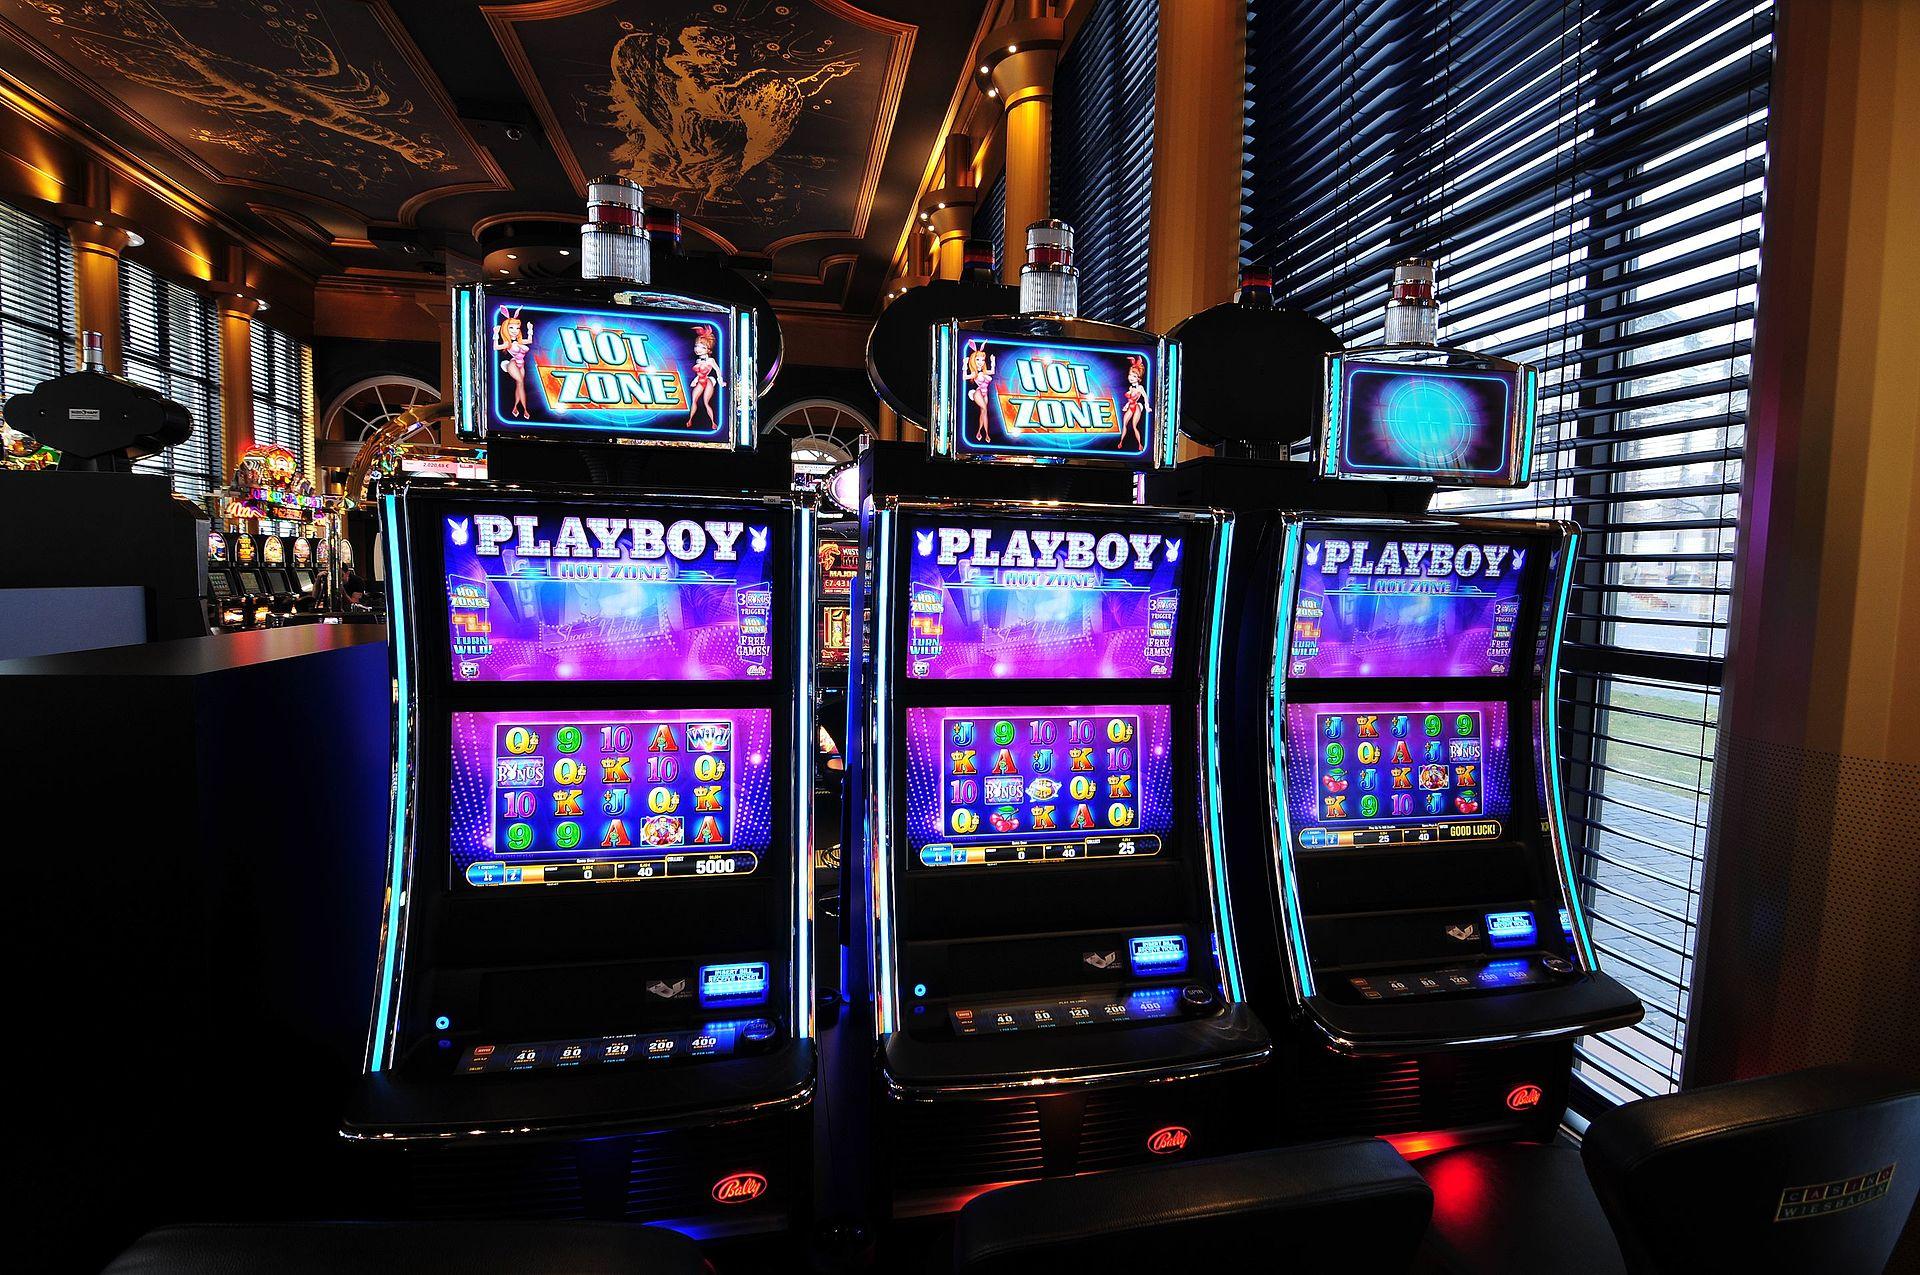 Spielautomat Gewinnchancen Slotpark Casino - 55396